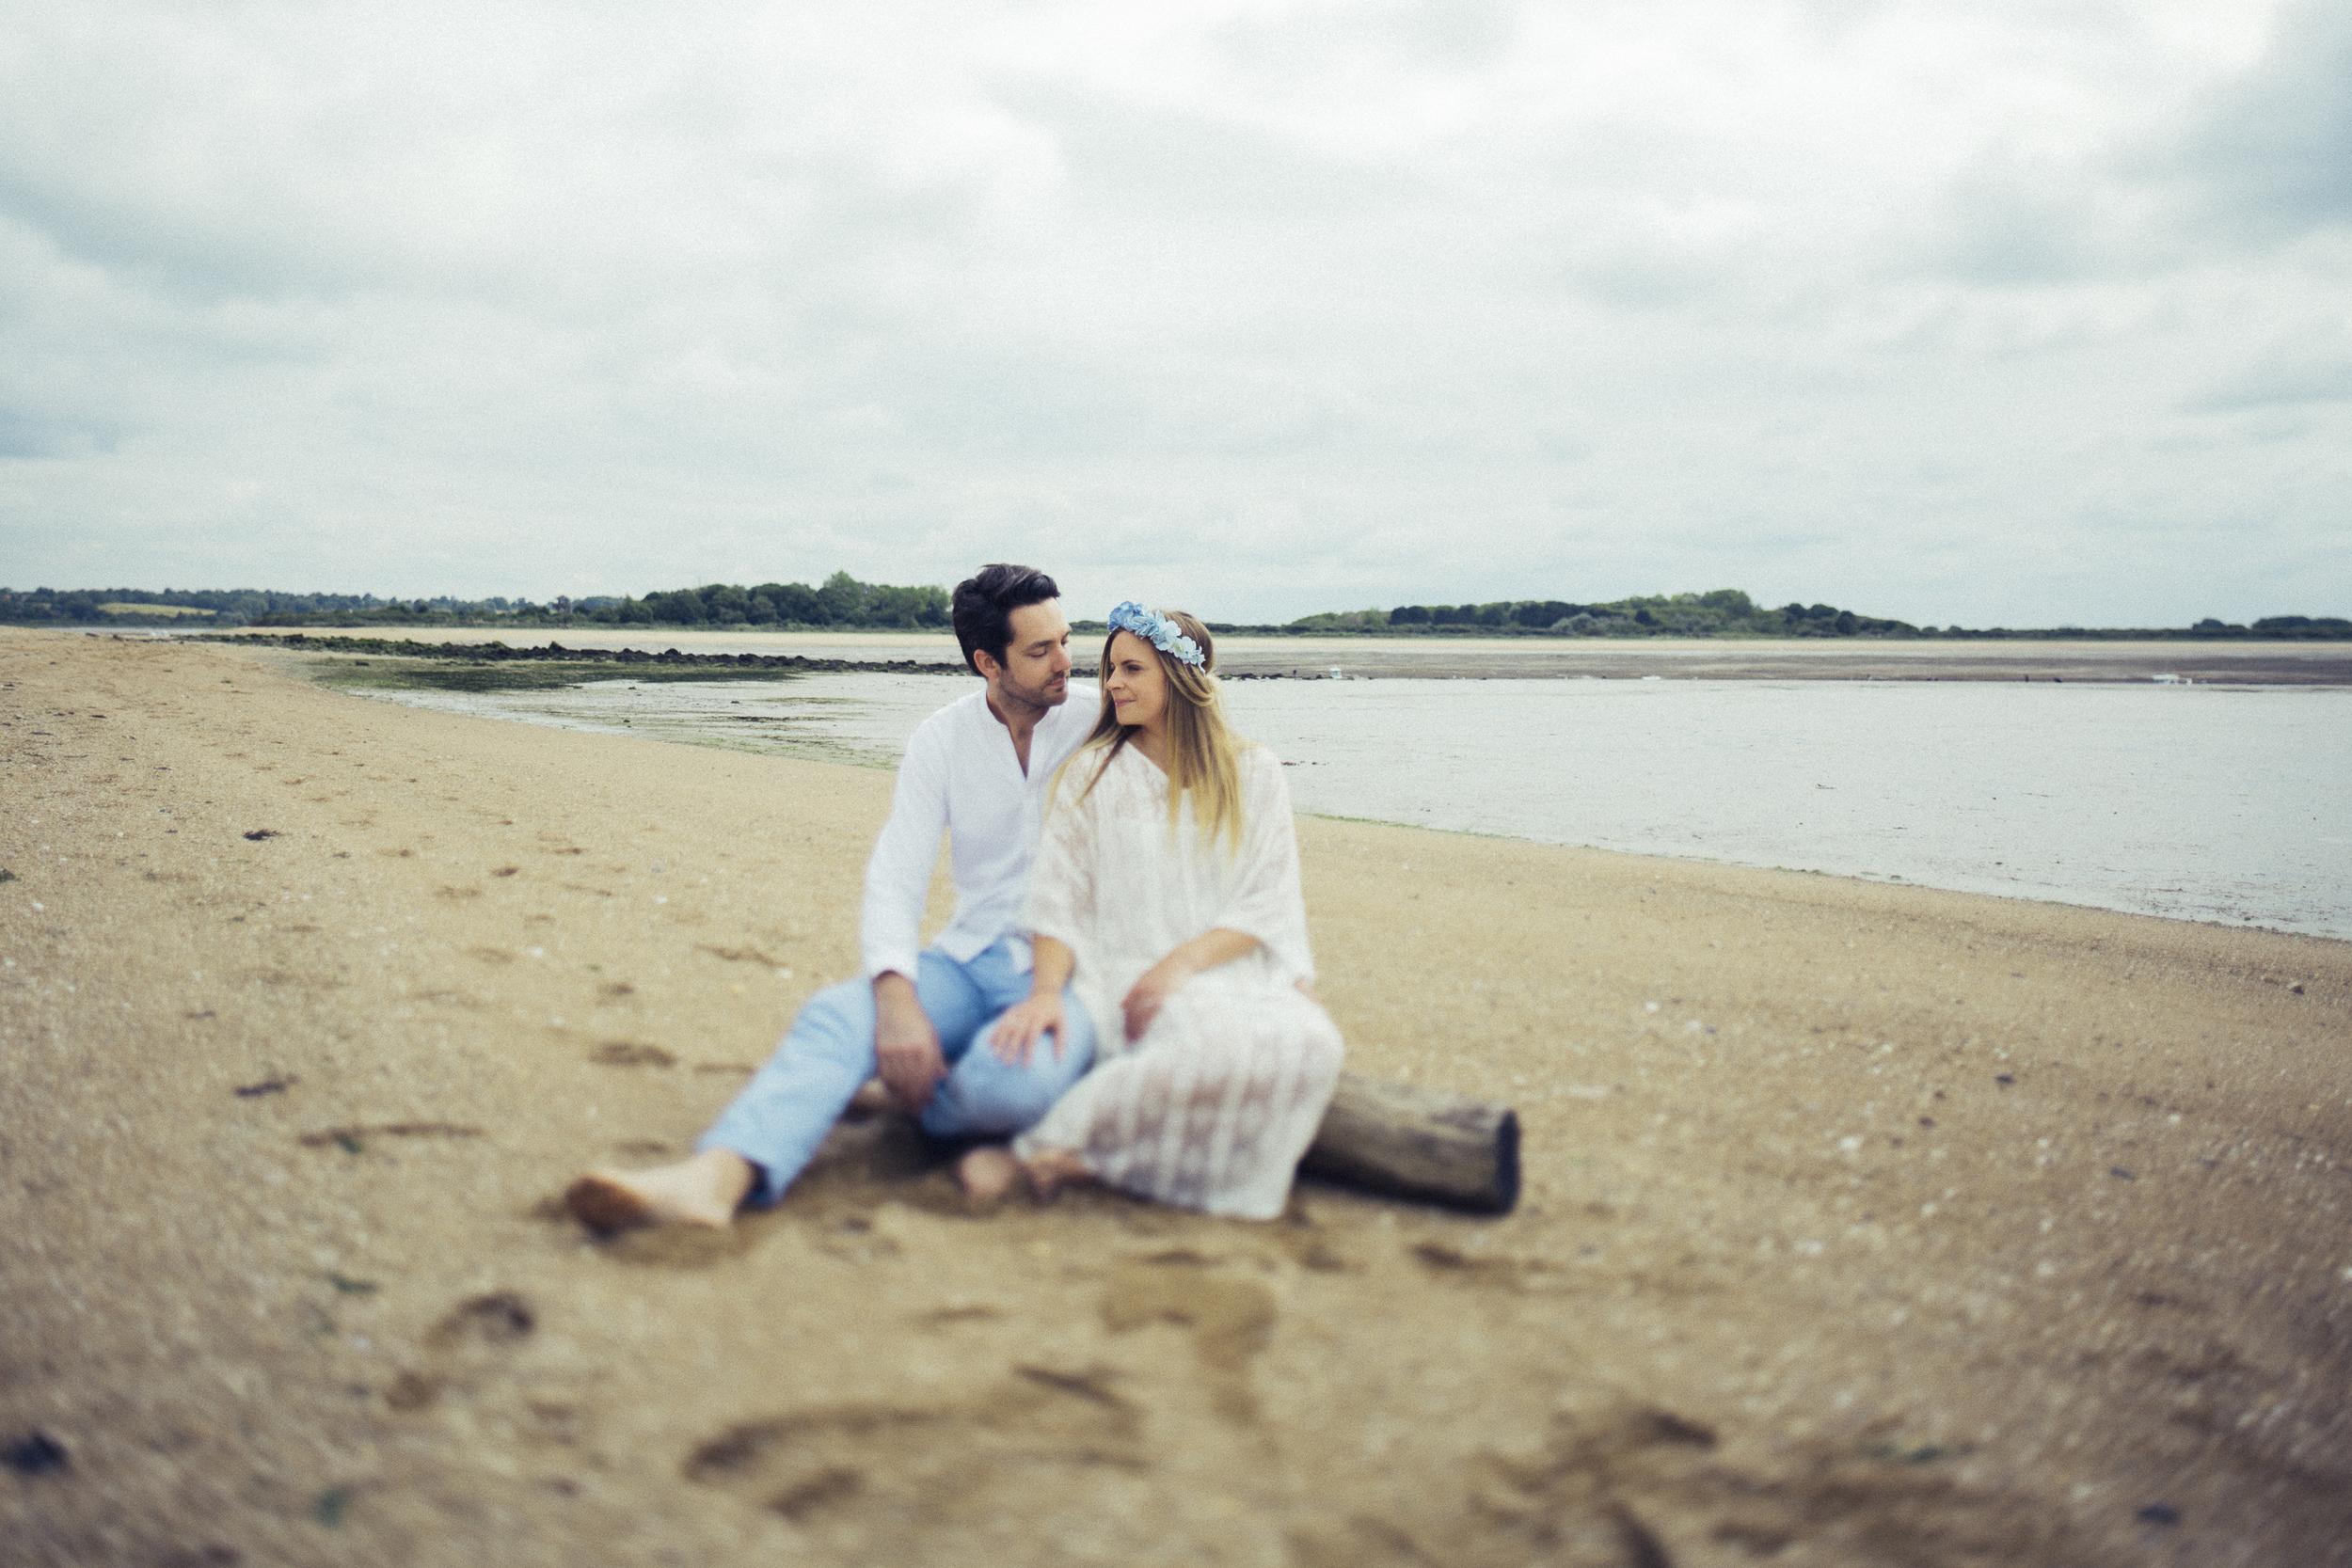 64-Wedding in Normandie 19 juin 2016.jpg